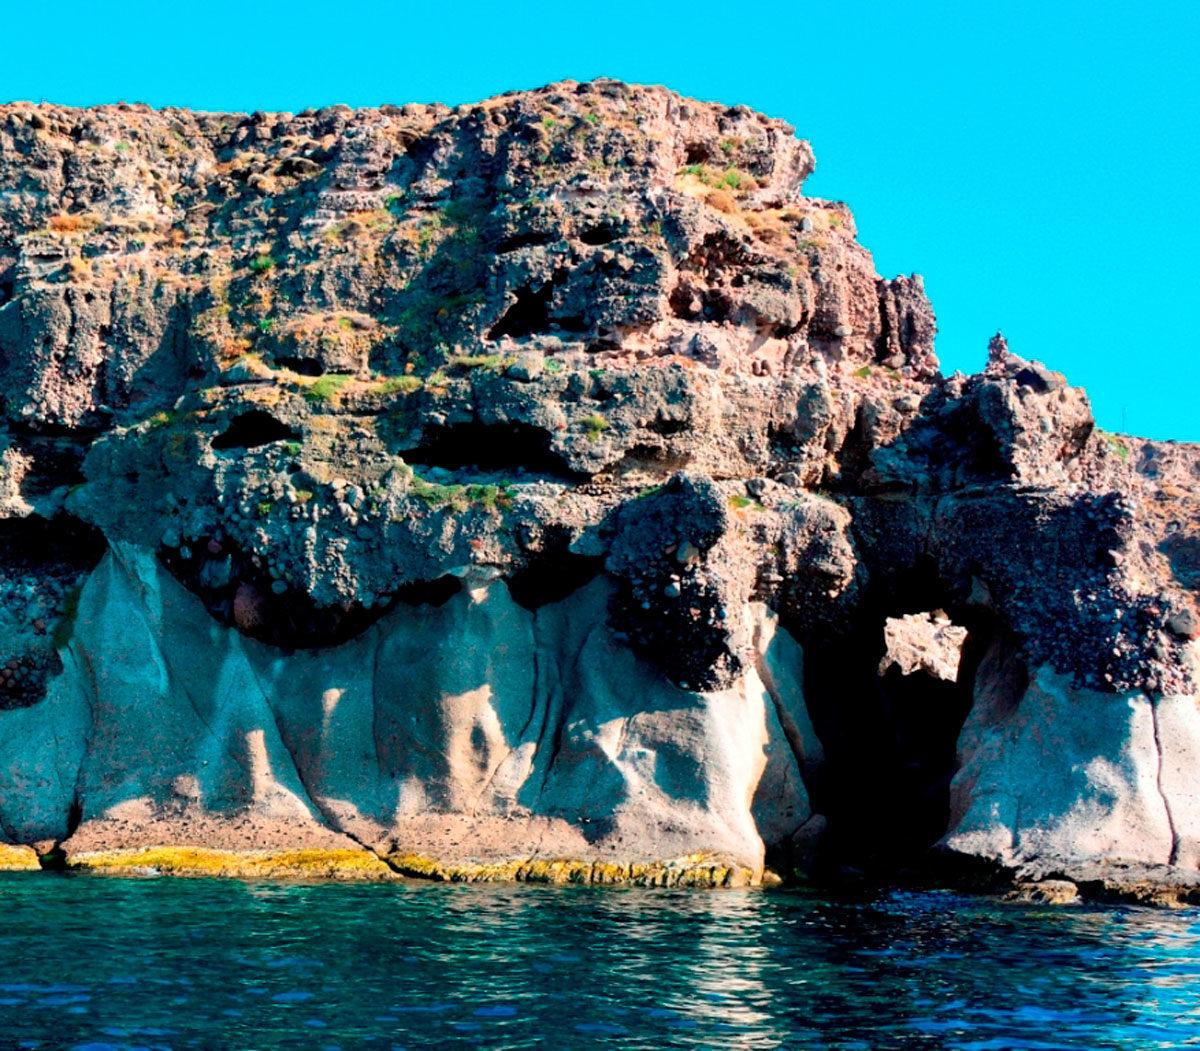 Arch, impressive geomorph on the west coast of Nisiopi.